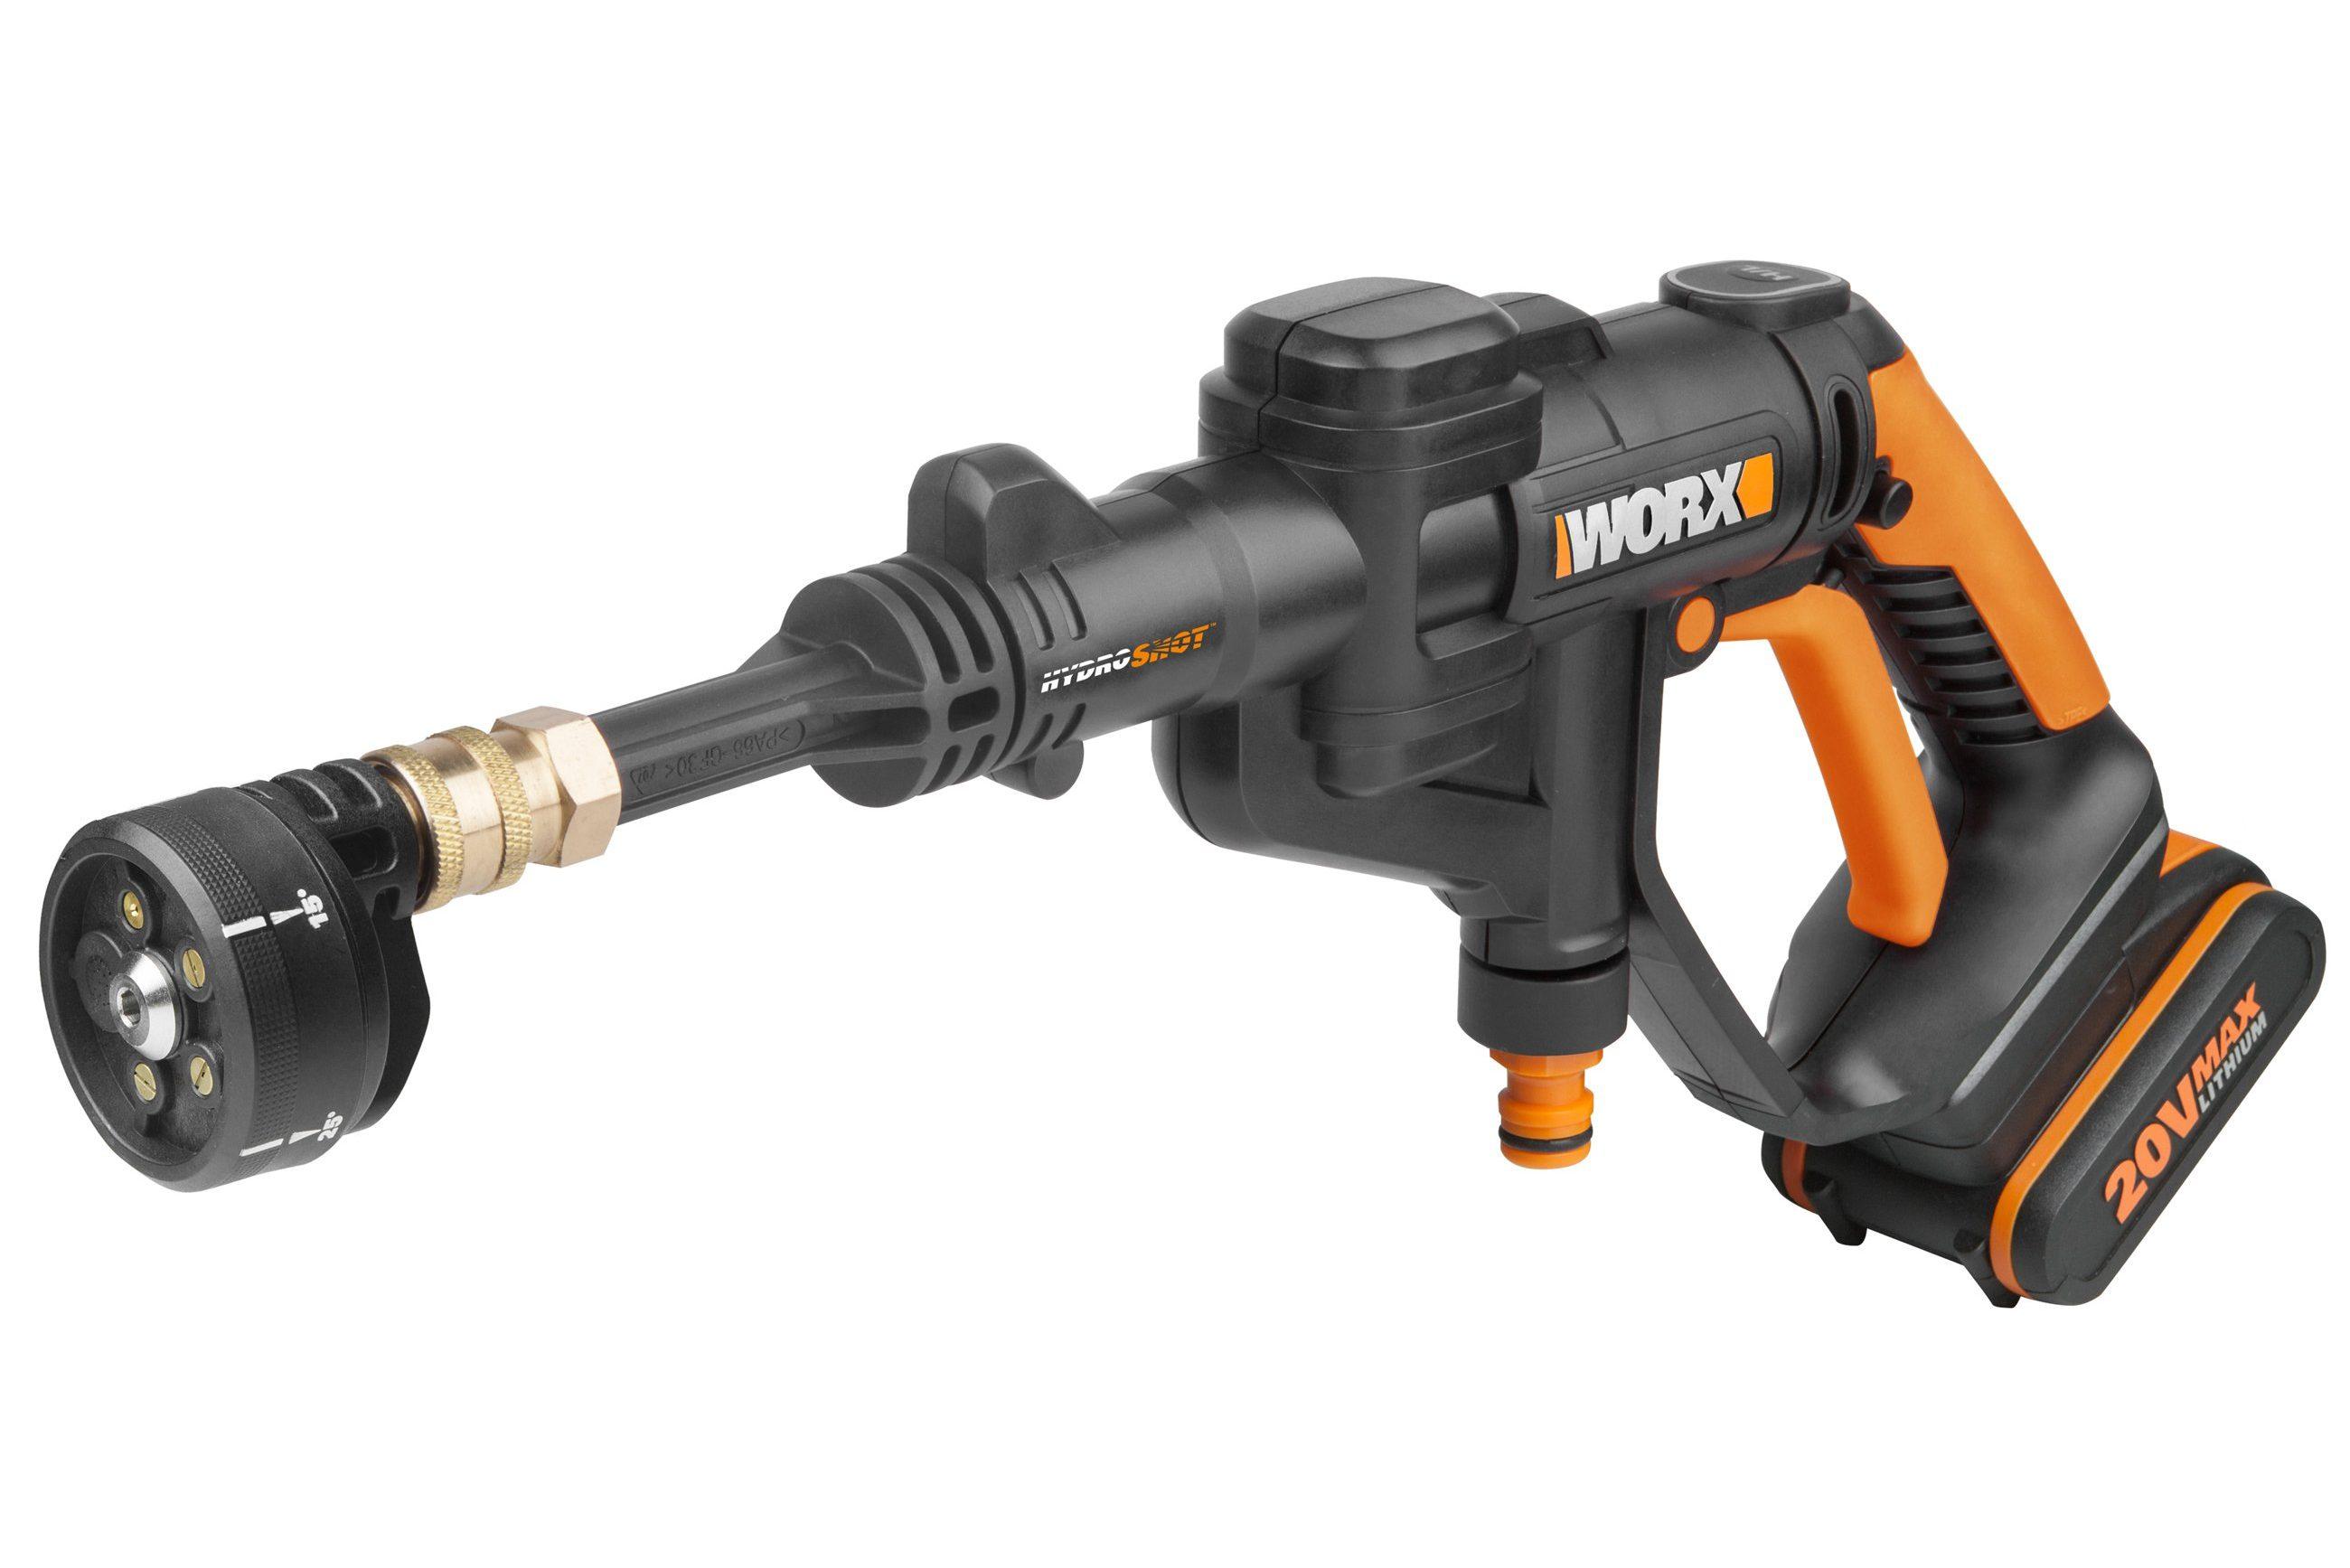 Worx Hydroshot 20V Max review - MBR